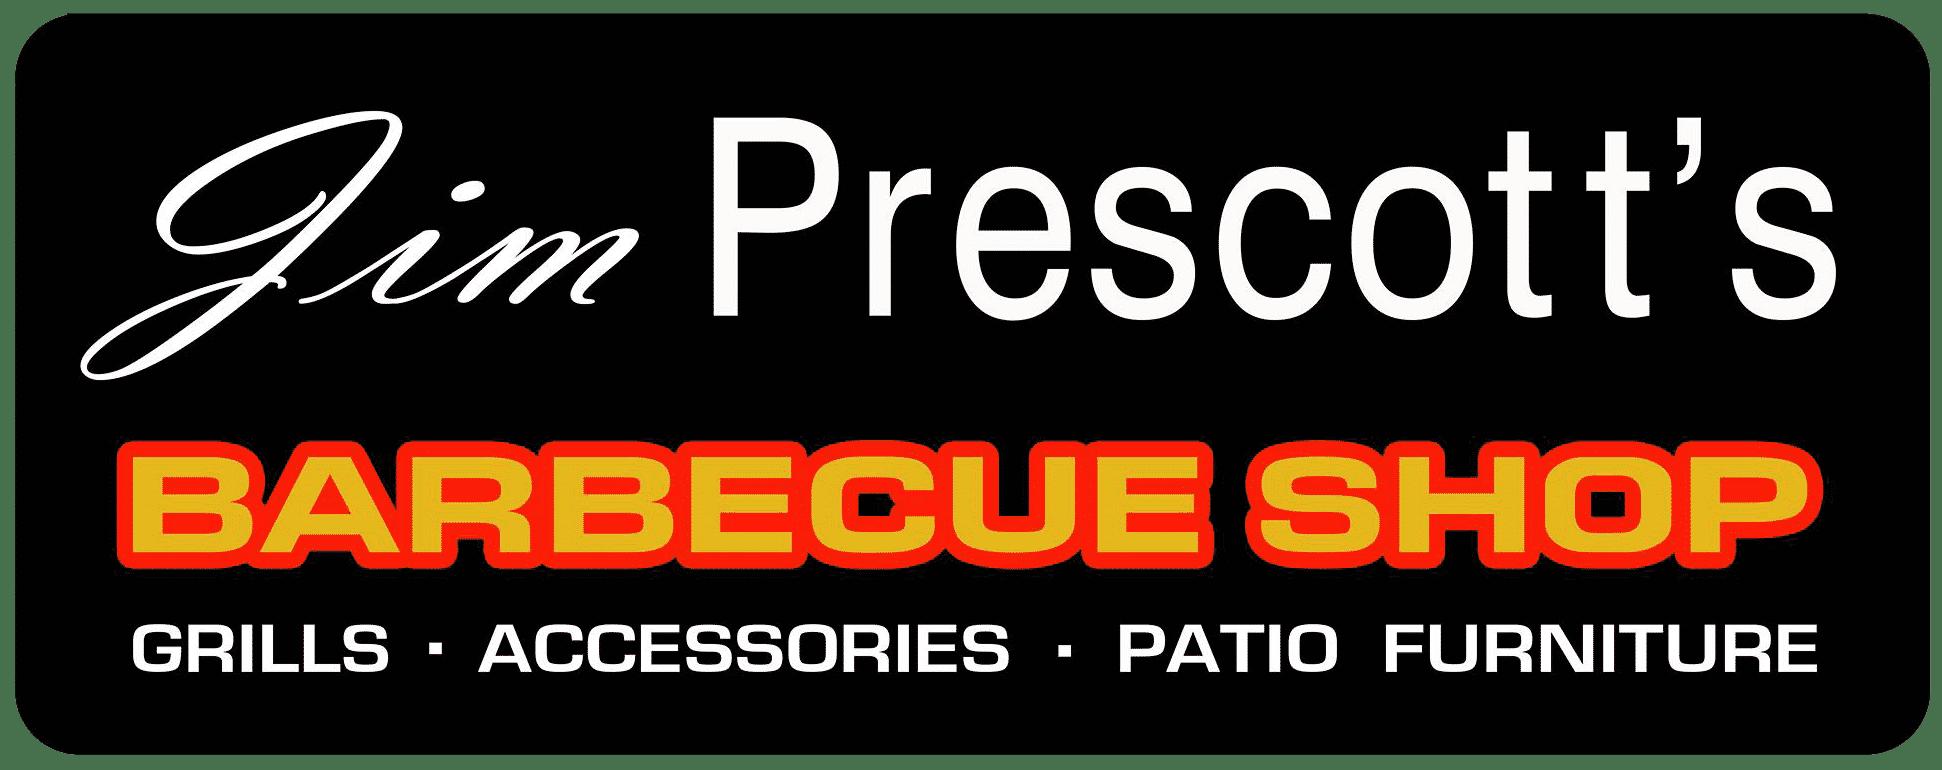 Jim-Prescotts-BBQ-Shop